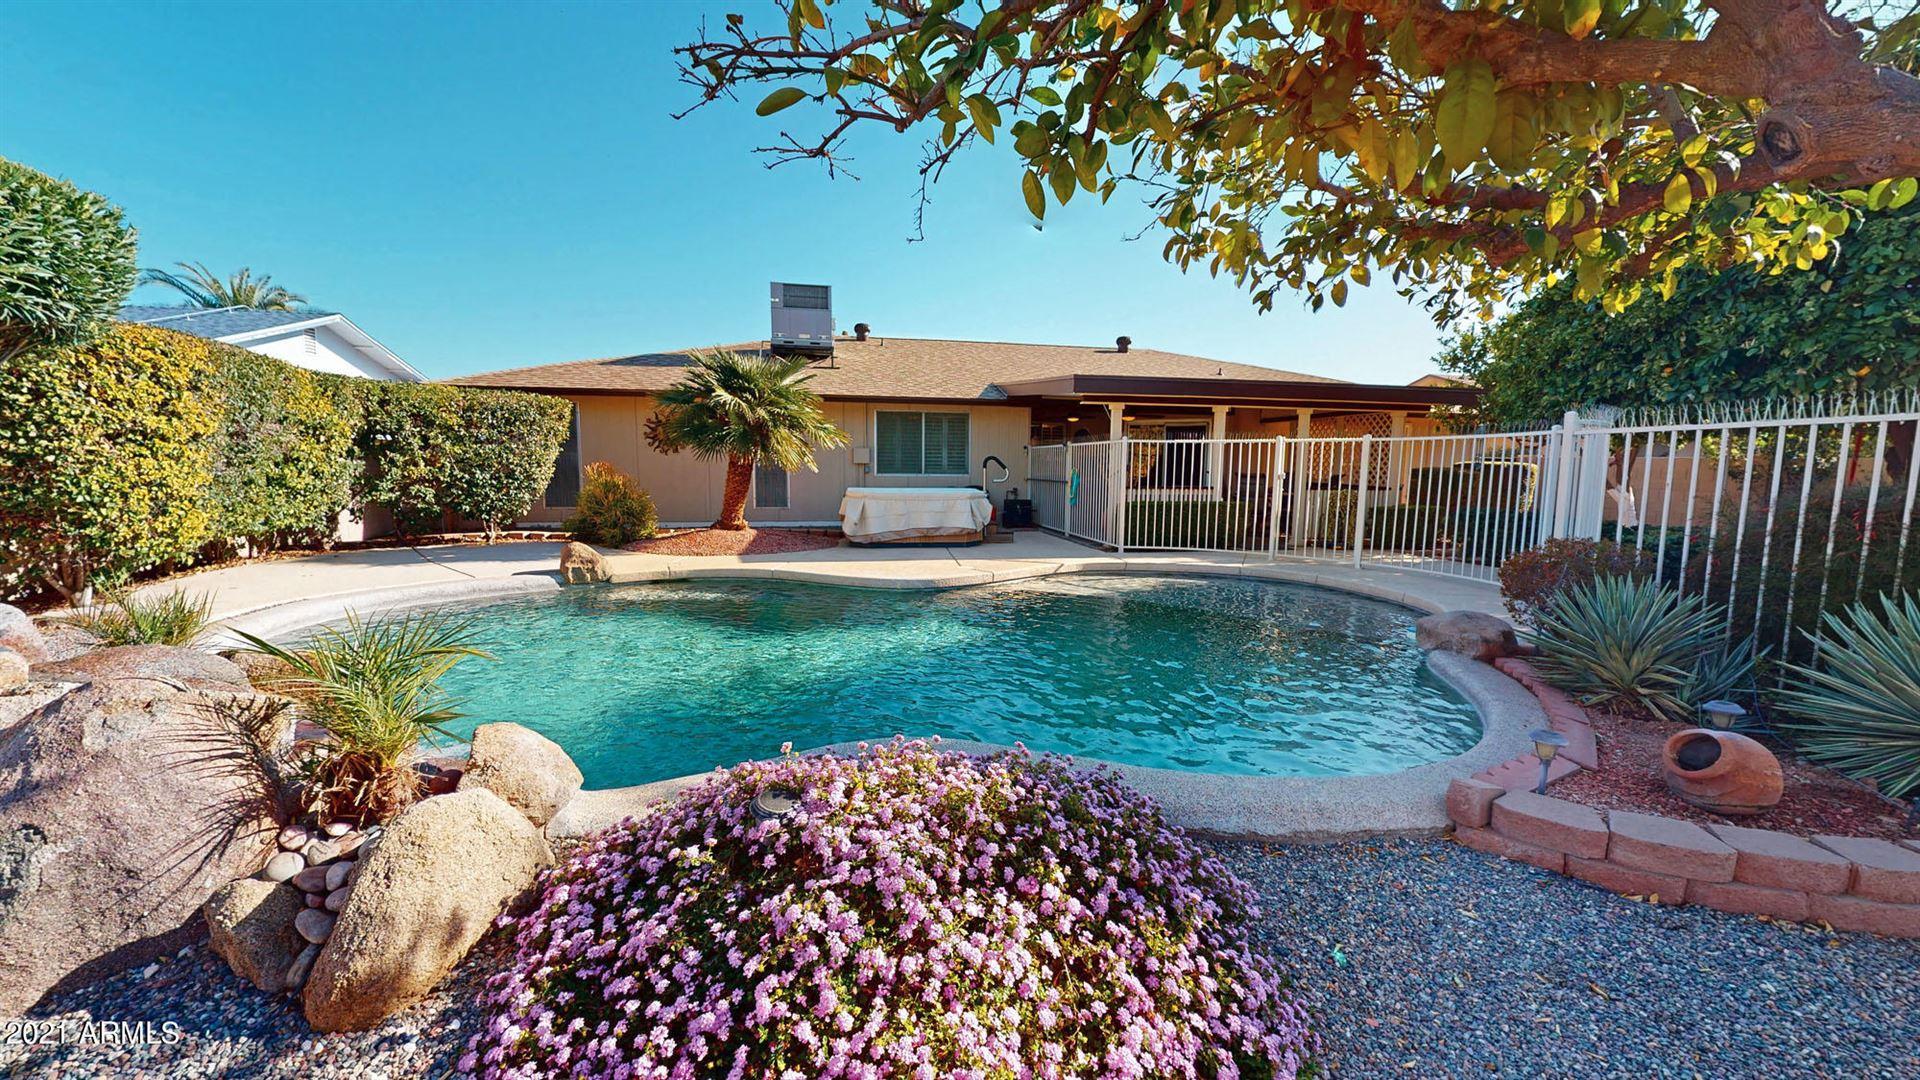 Photo of 19838 N CONCHO Circle, Sun City, AZ 85373 (MLS # 6200584)